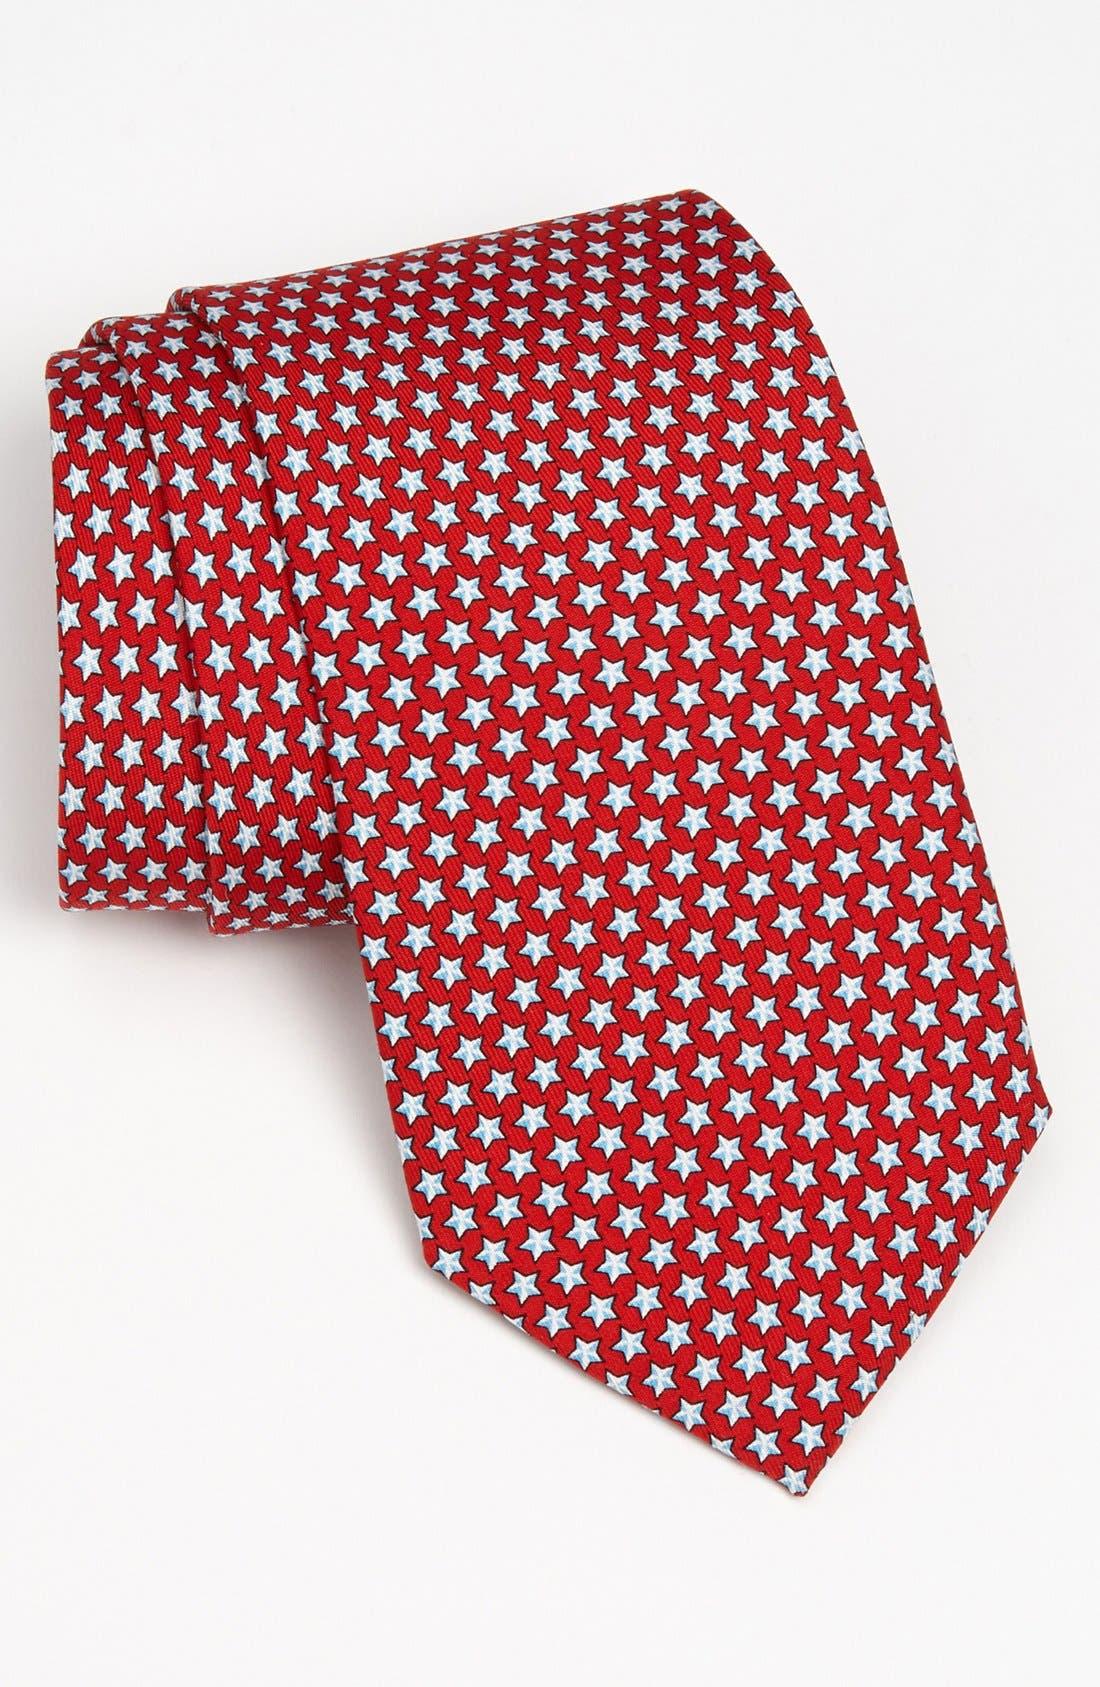 Main Image - Vineyard Vines 'Stars' Silk Tie